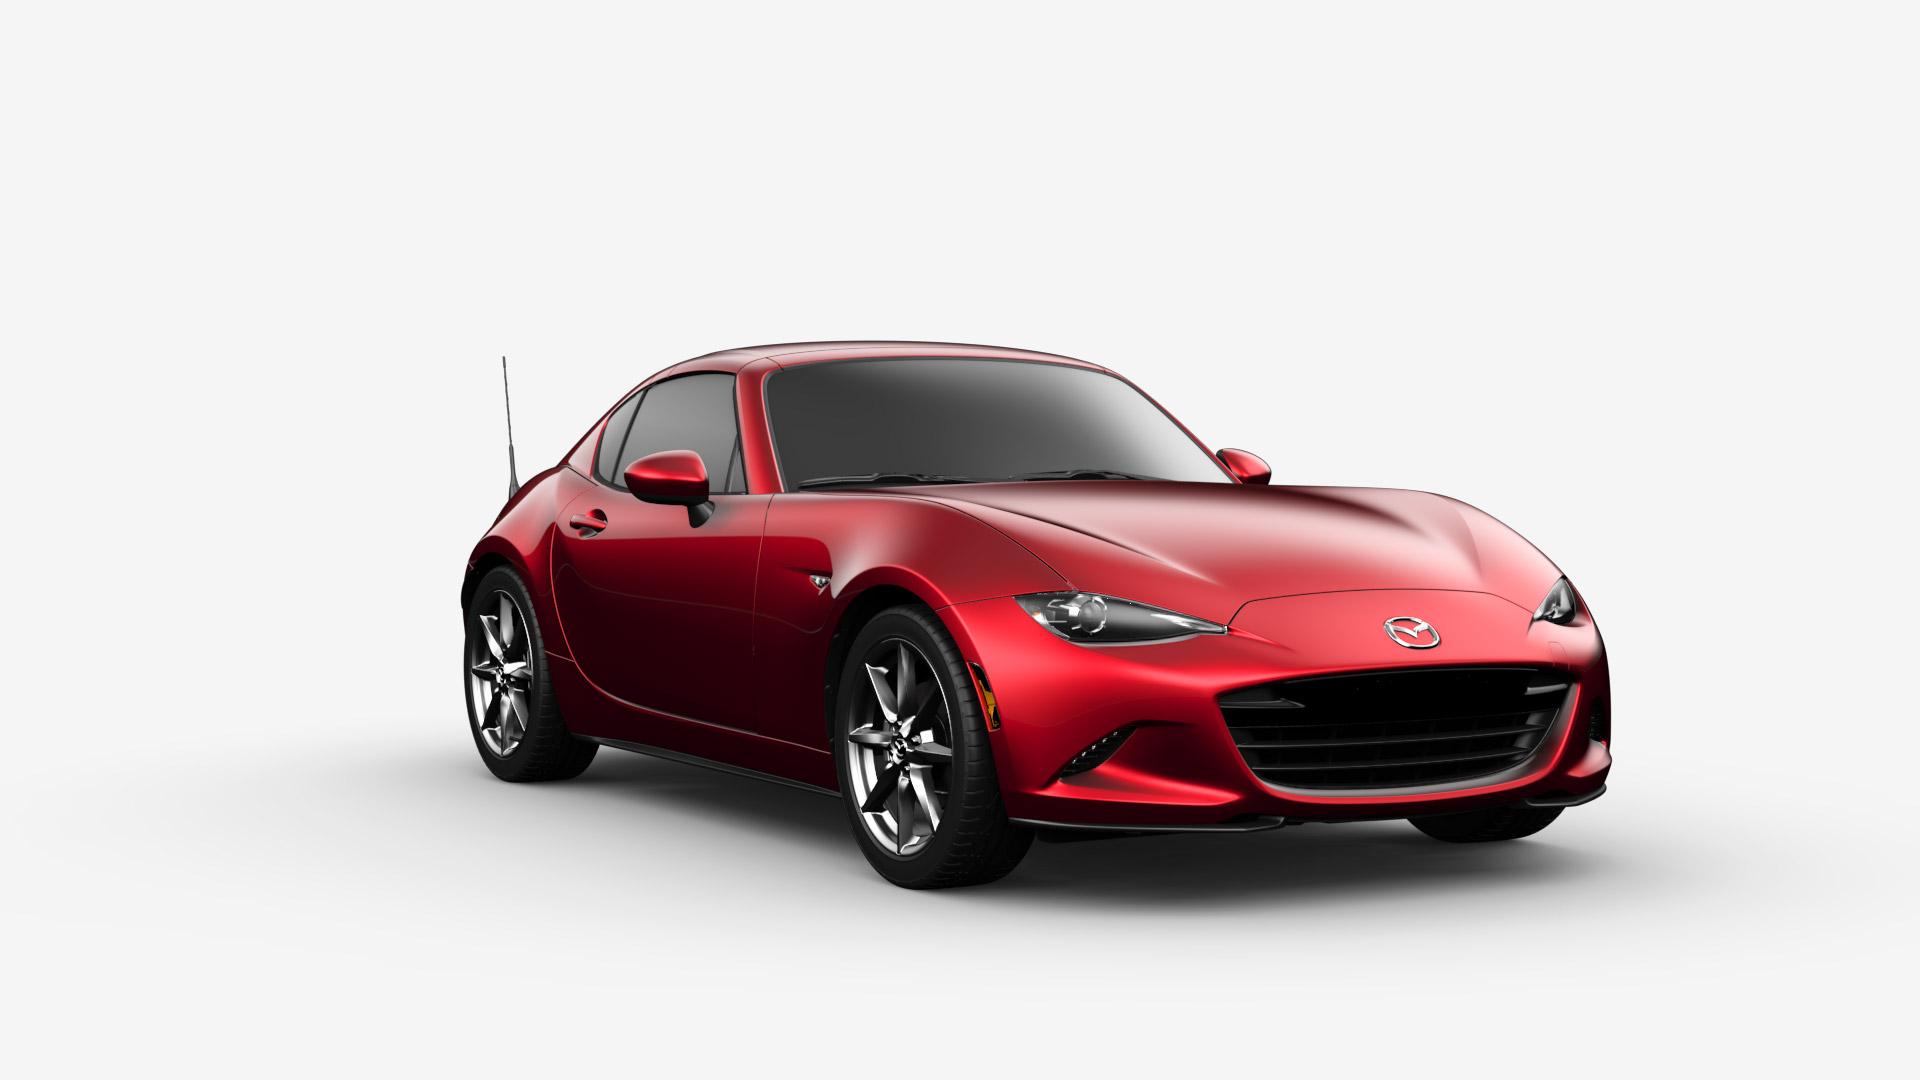 2017 mazda mx 5 miata rf hard top convertible mazda usa autos post. Black Bedroom Furniture Sets. Home Design Ideas